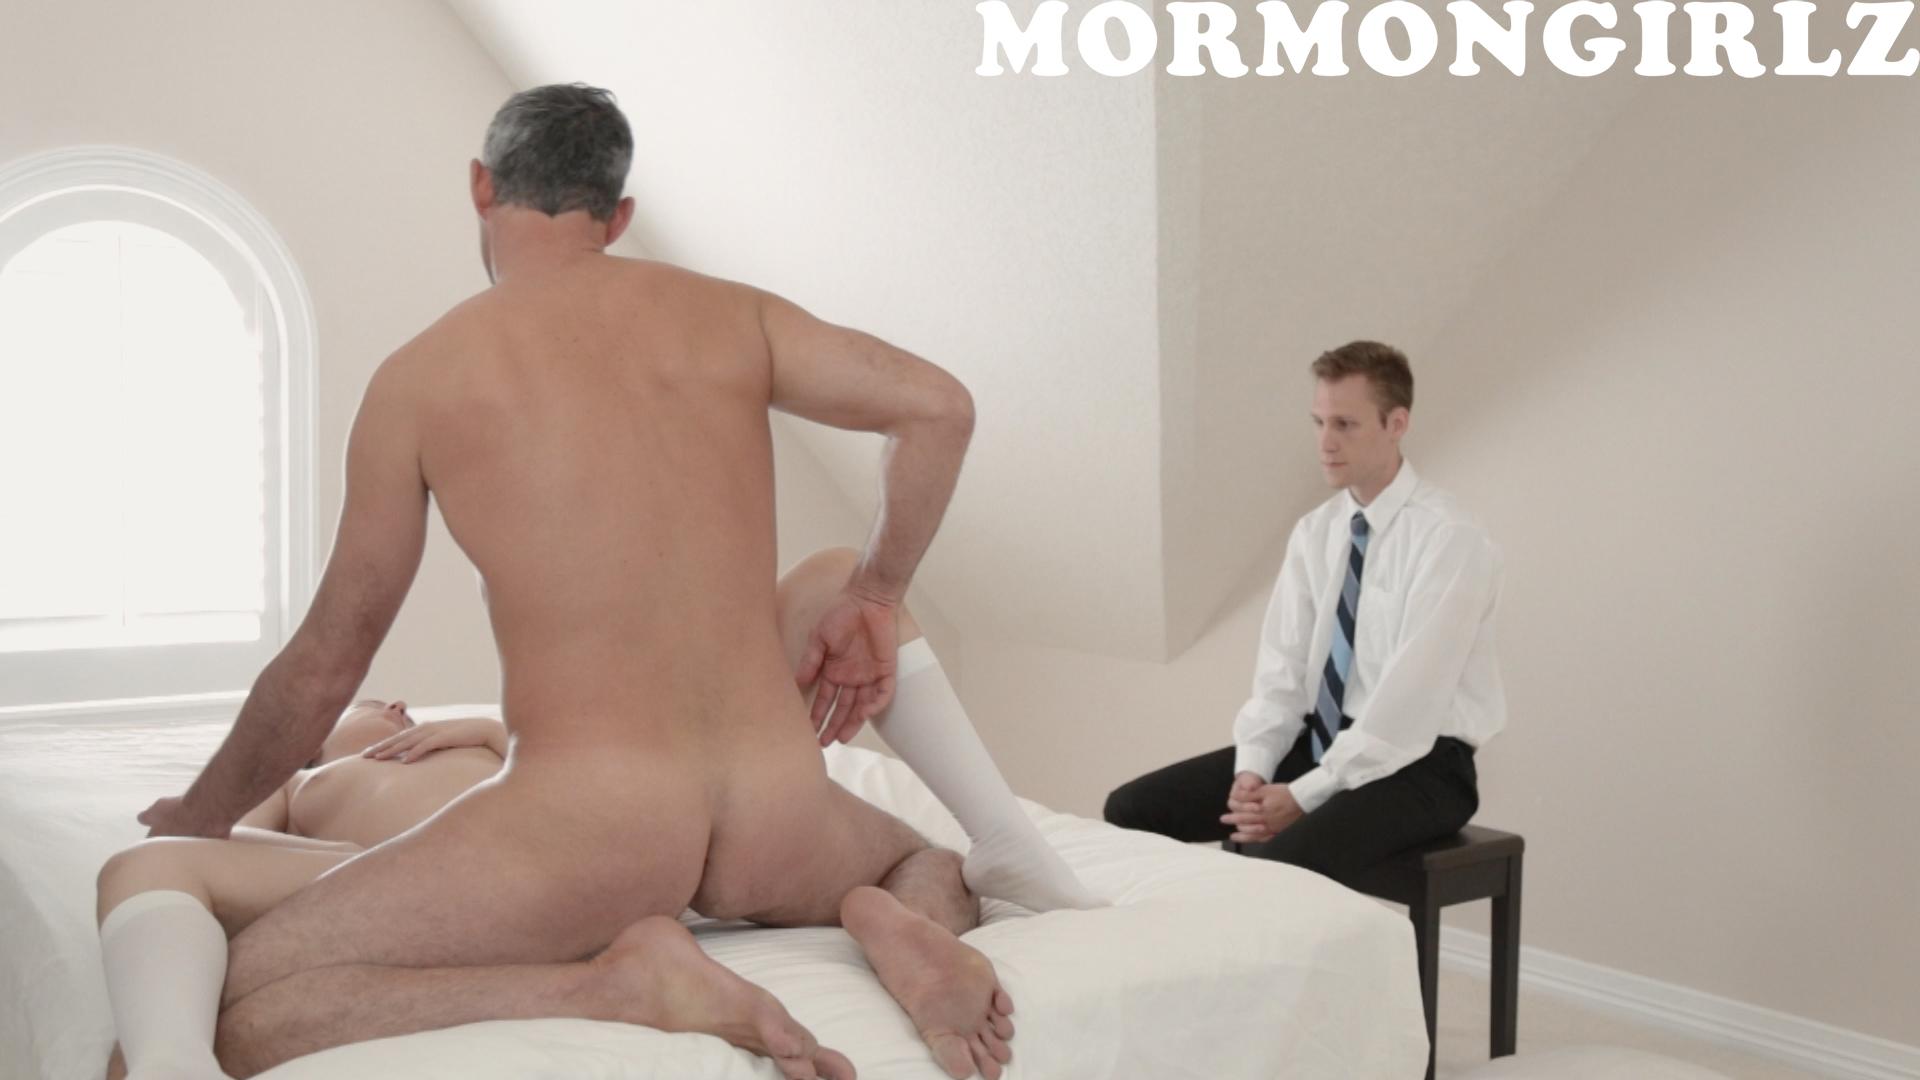 076_mormongirlz_0034